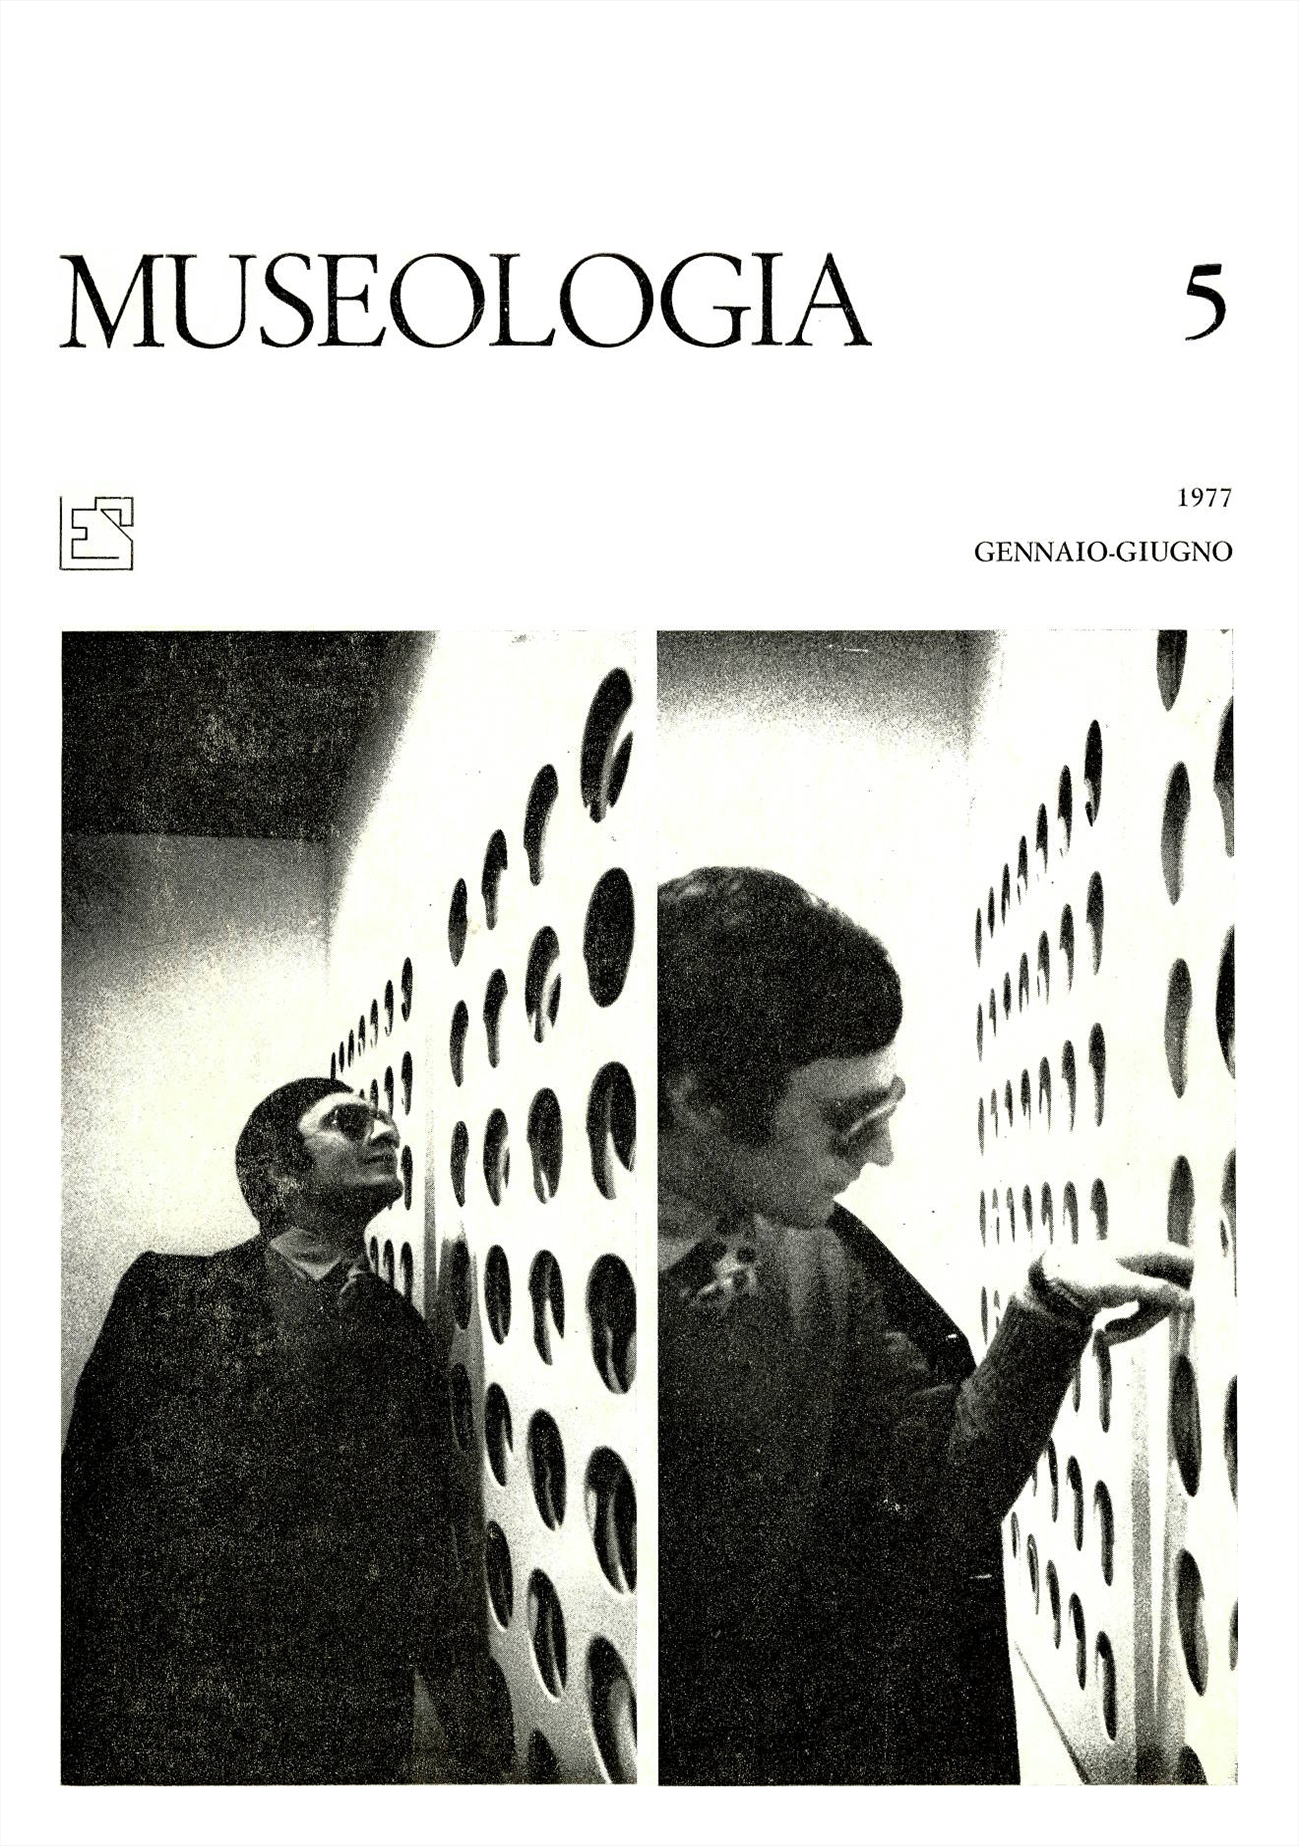 Museologia n°5, Gennaio-Giugno 1977